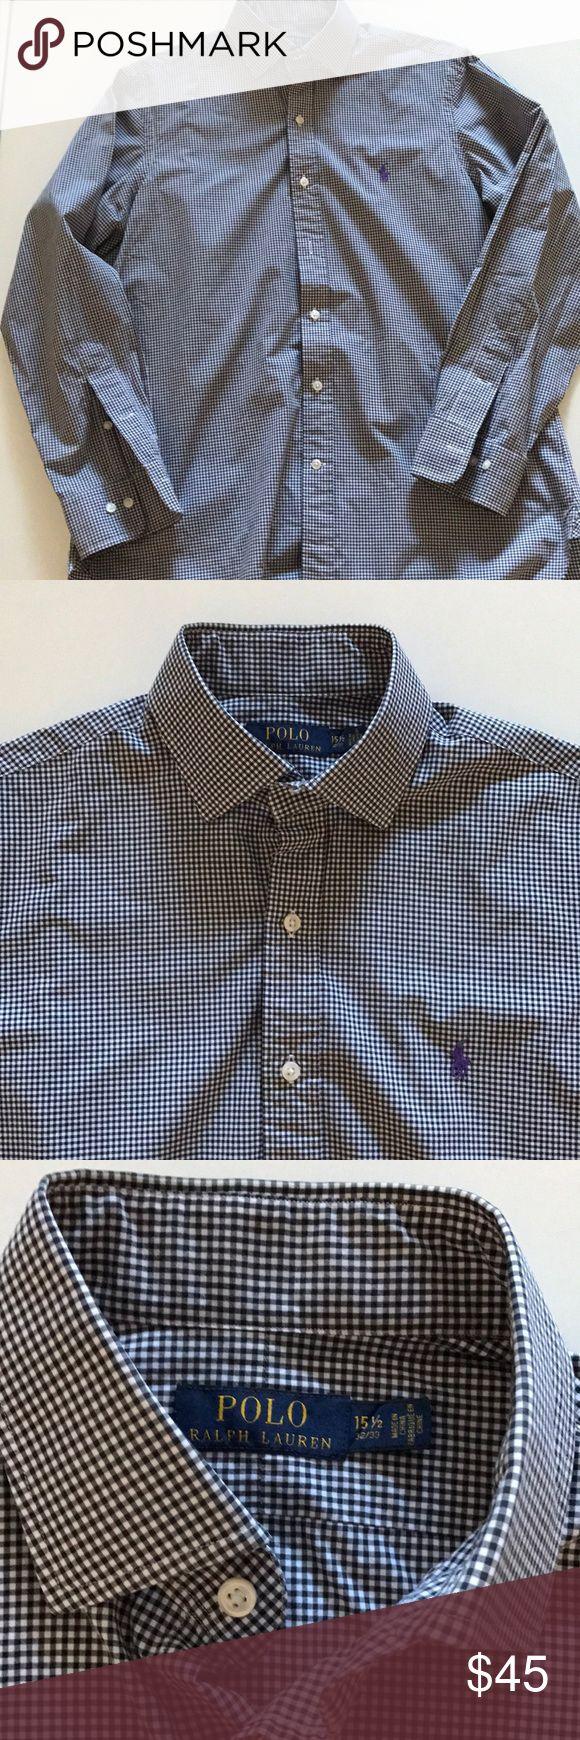 [Polo Ralph Lauren] Men's Black/White Check Shirt [Polo Ralph Lauren] black/white check shirt. 15 1/2 32/33. Purple Pony Polo by Ralph Lauren Shirts Dress Shirts